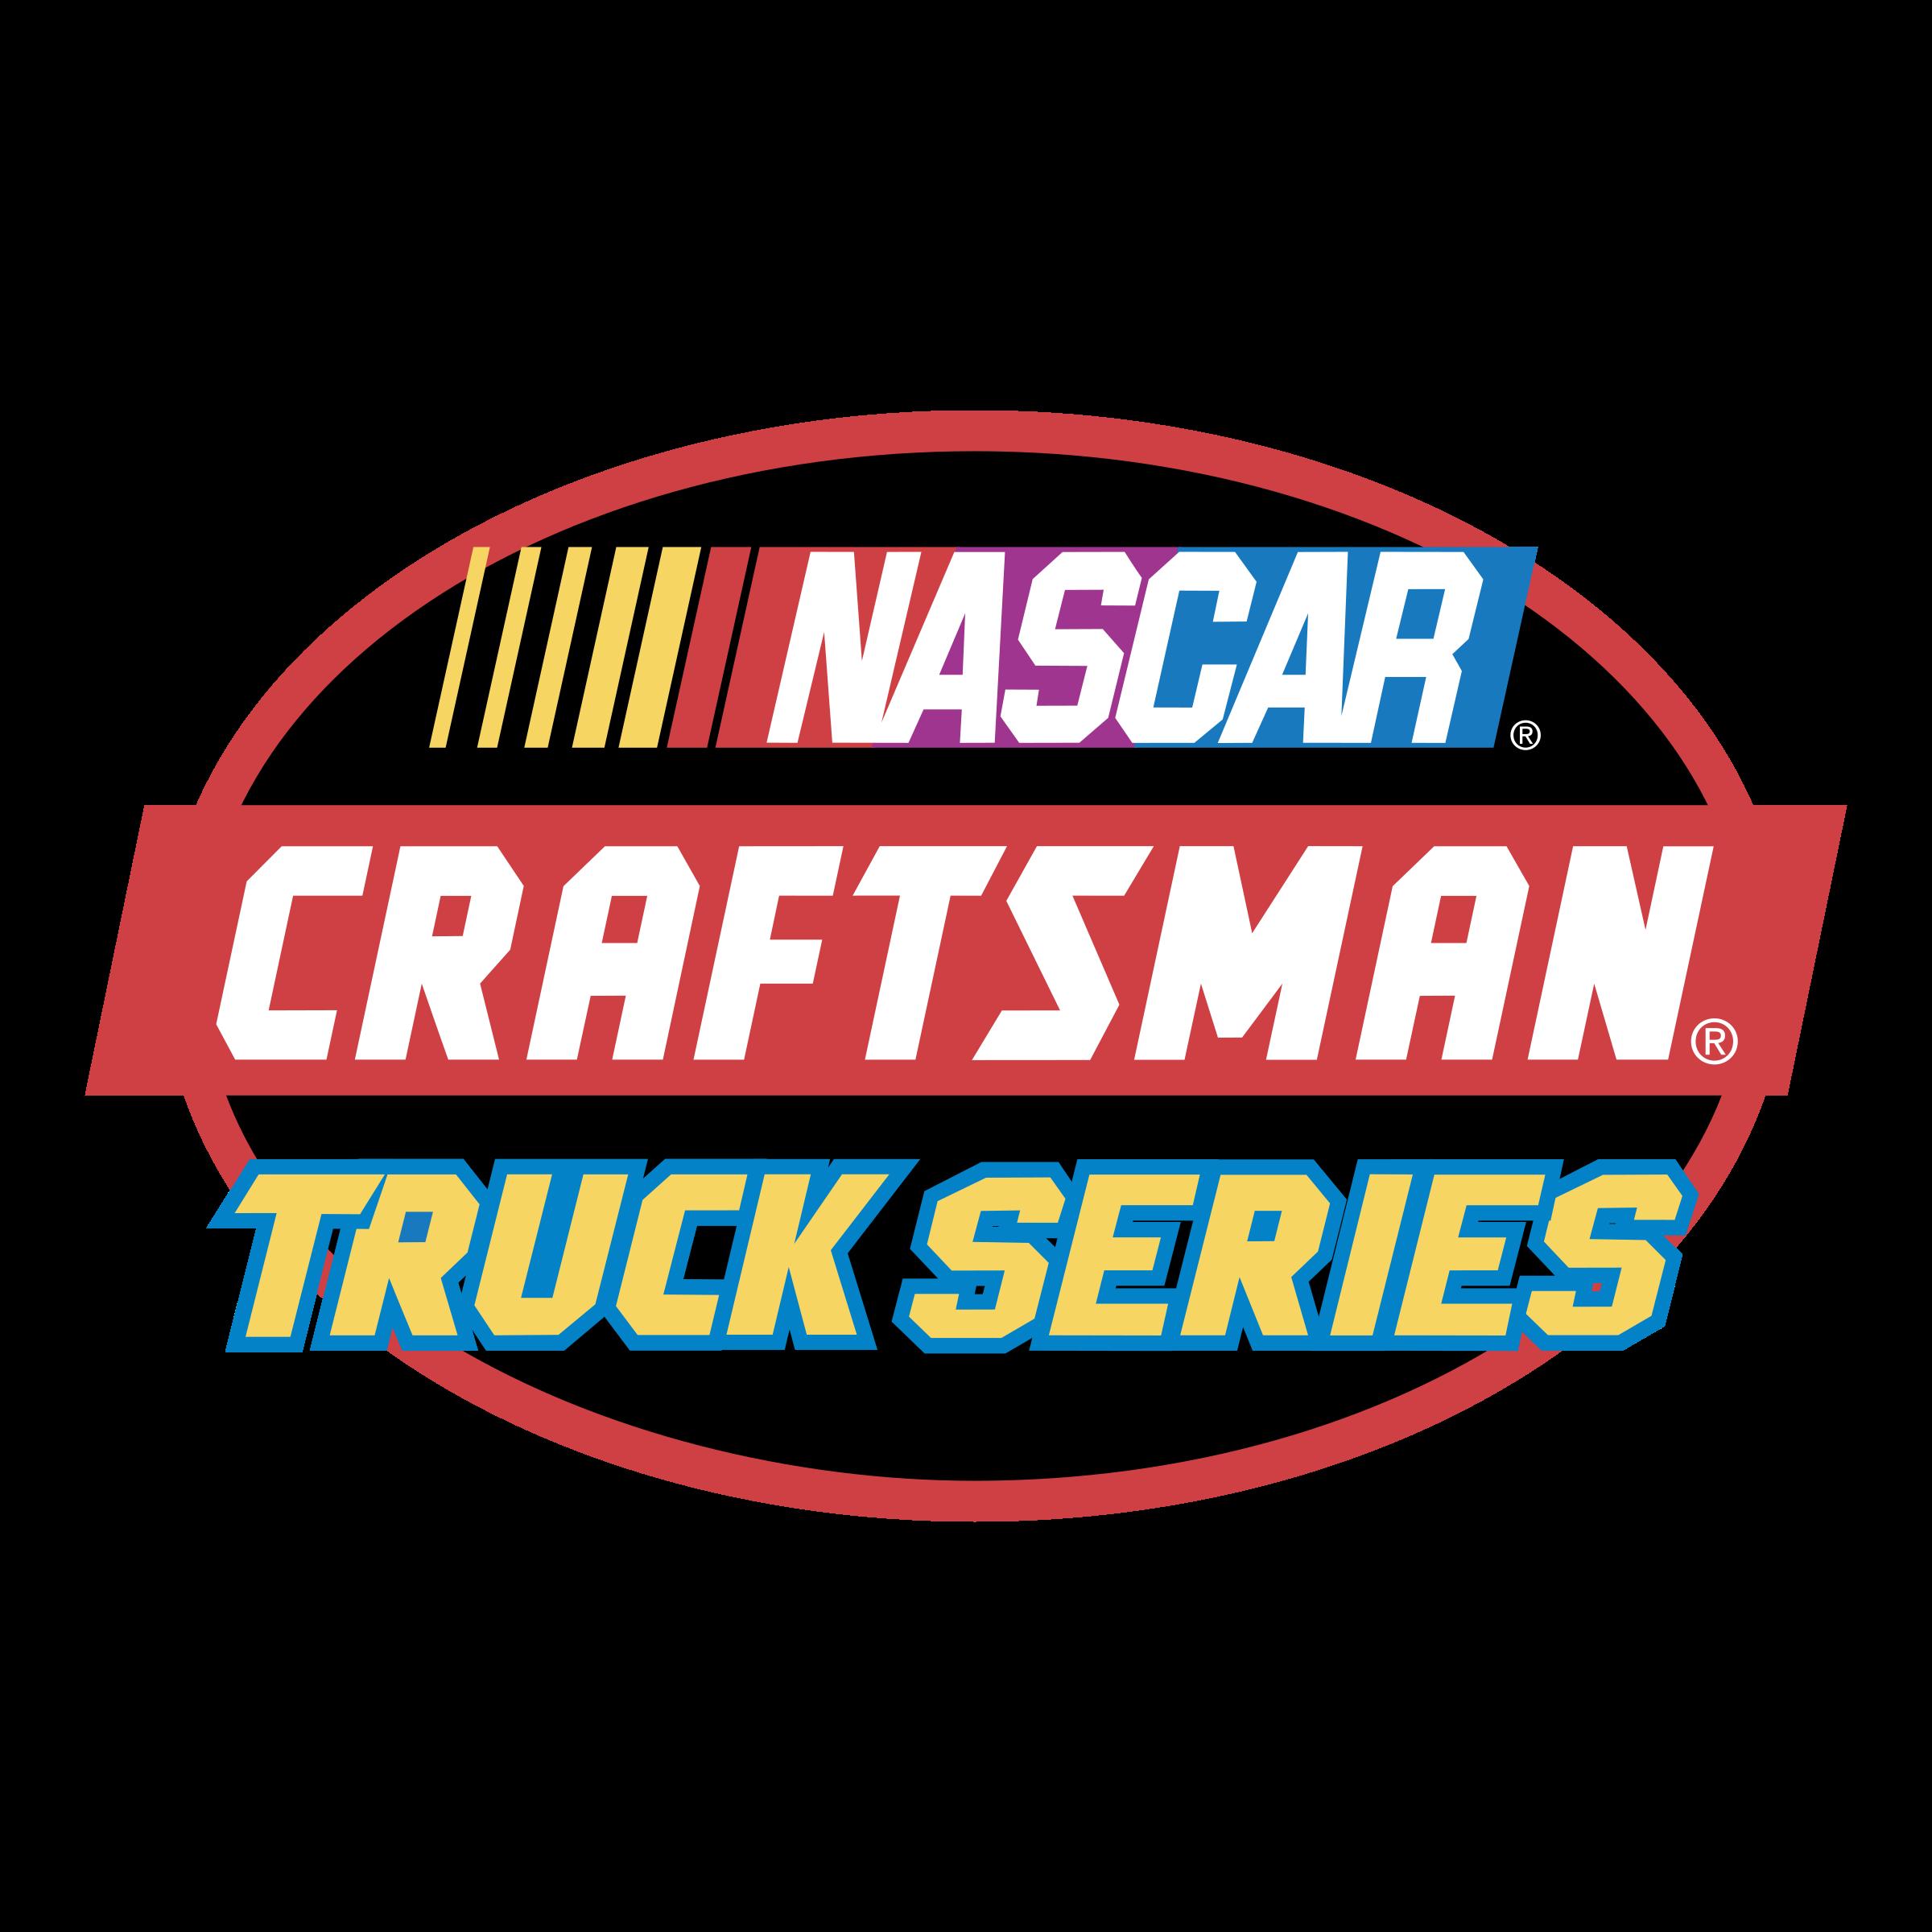 Craftsman Truck Series Logo PNG Transparent & SVG Vector ...